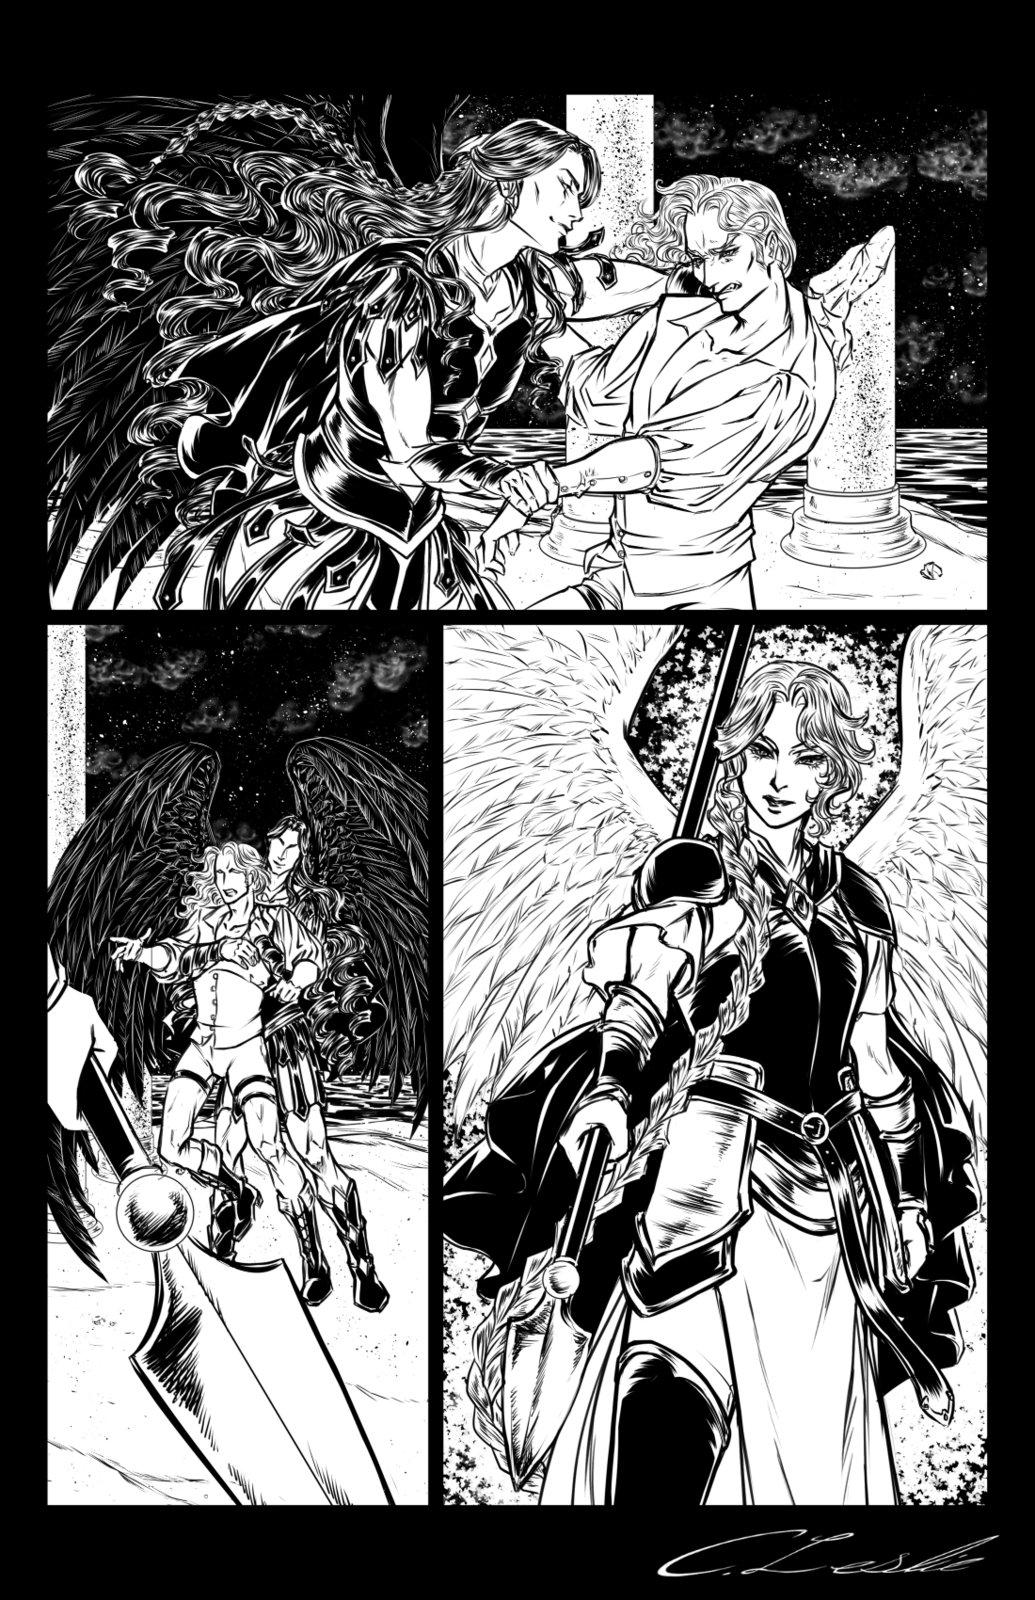 Final Scene: Page 2